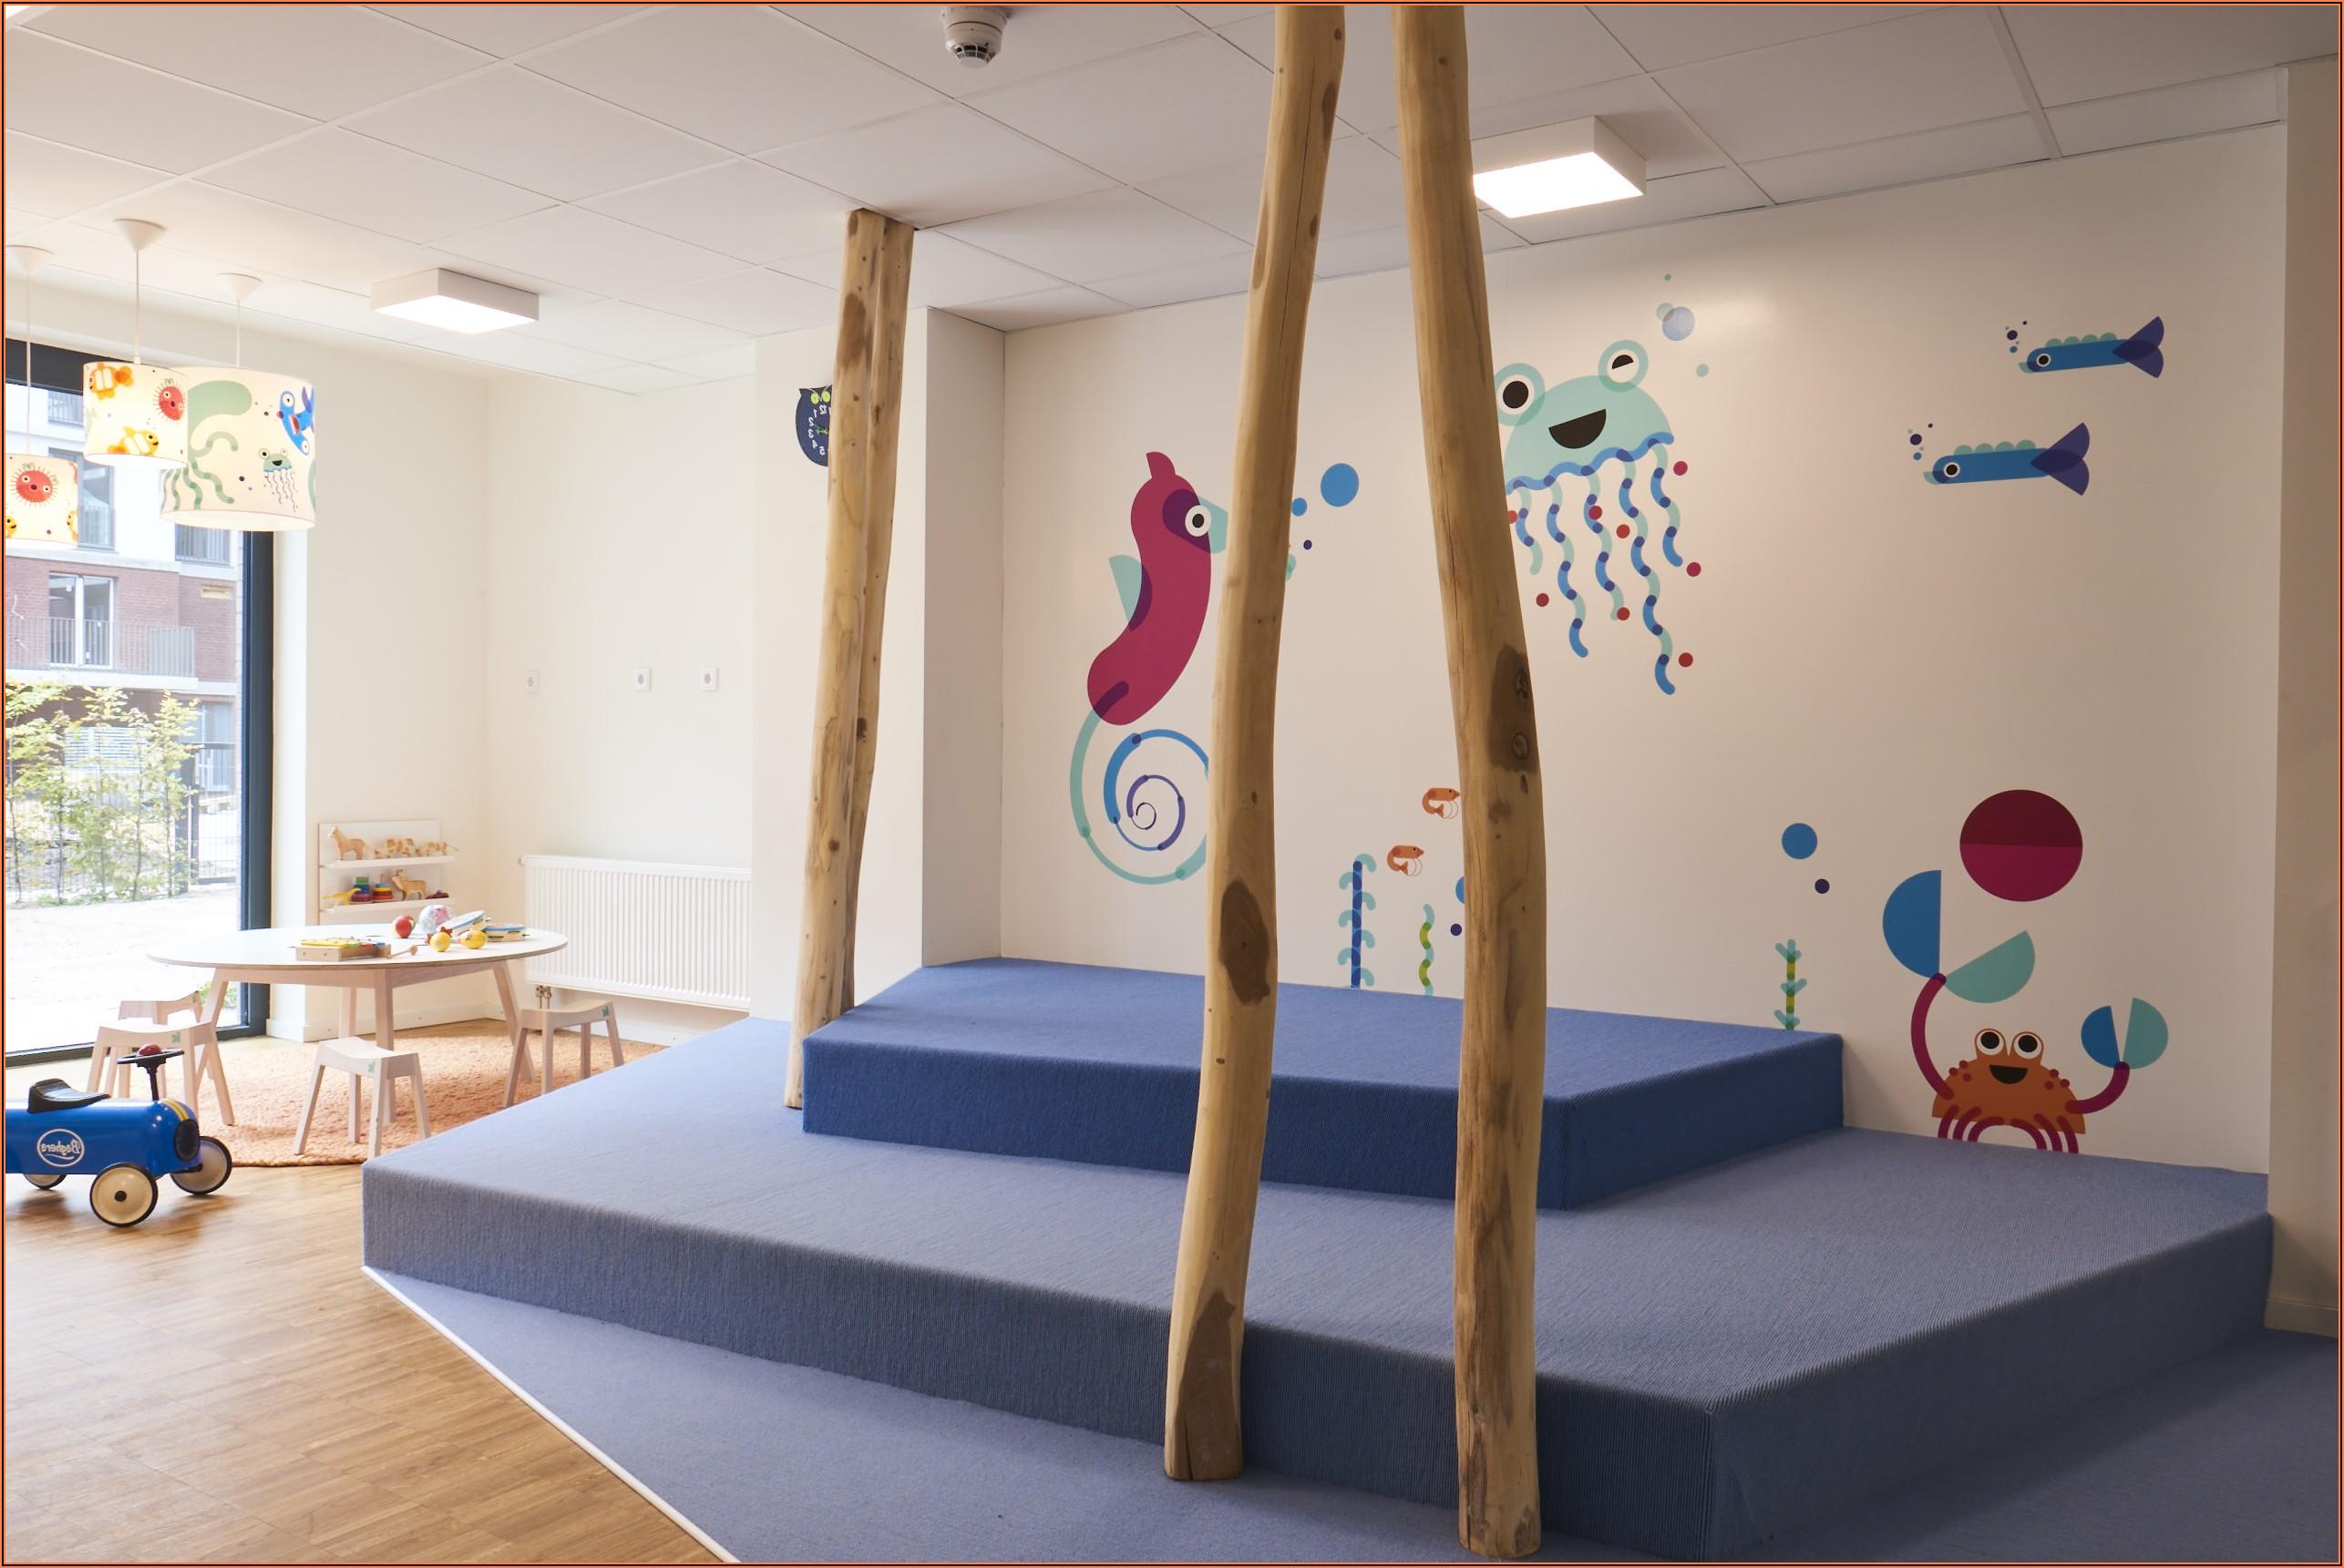 Kita Kinderzimmer Hamburg Stellenangebote